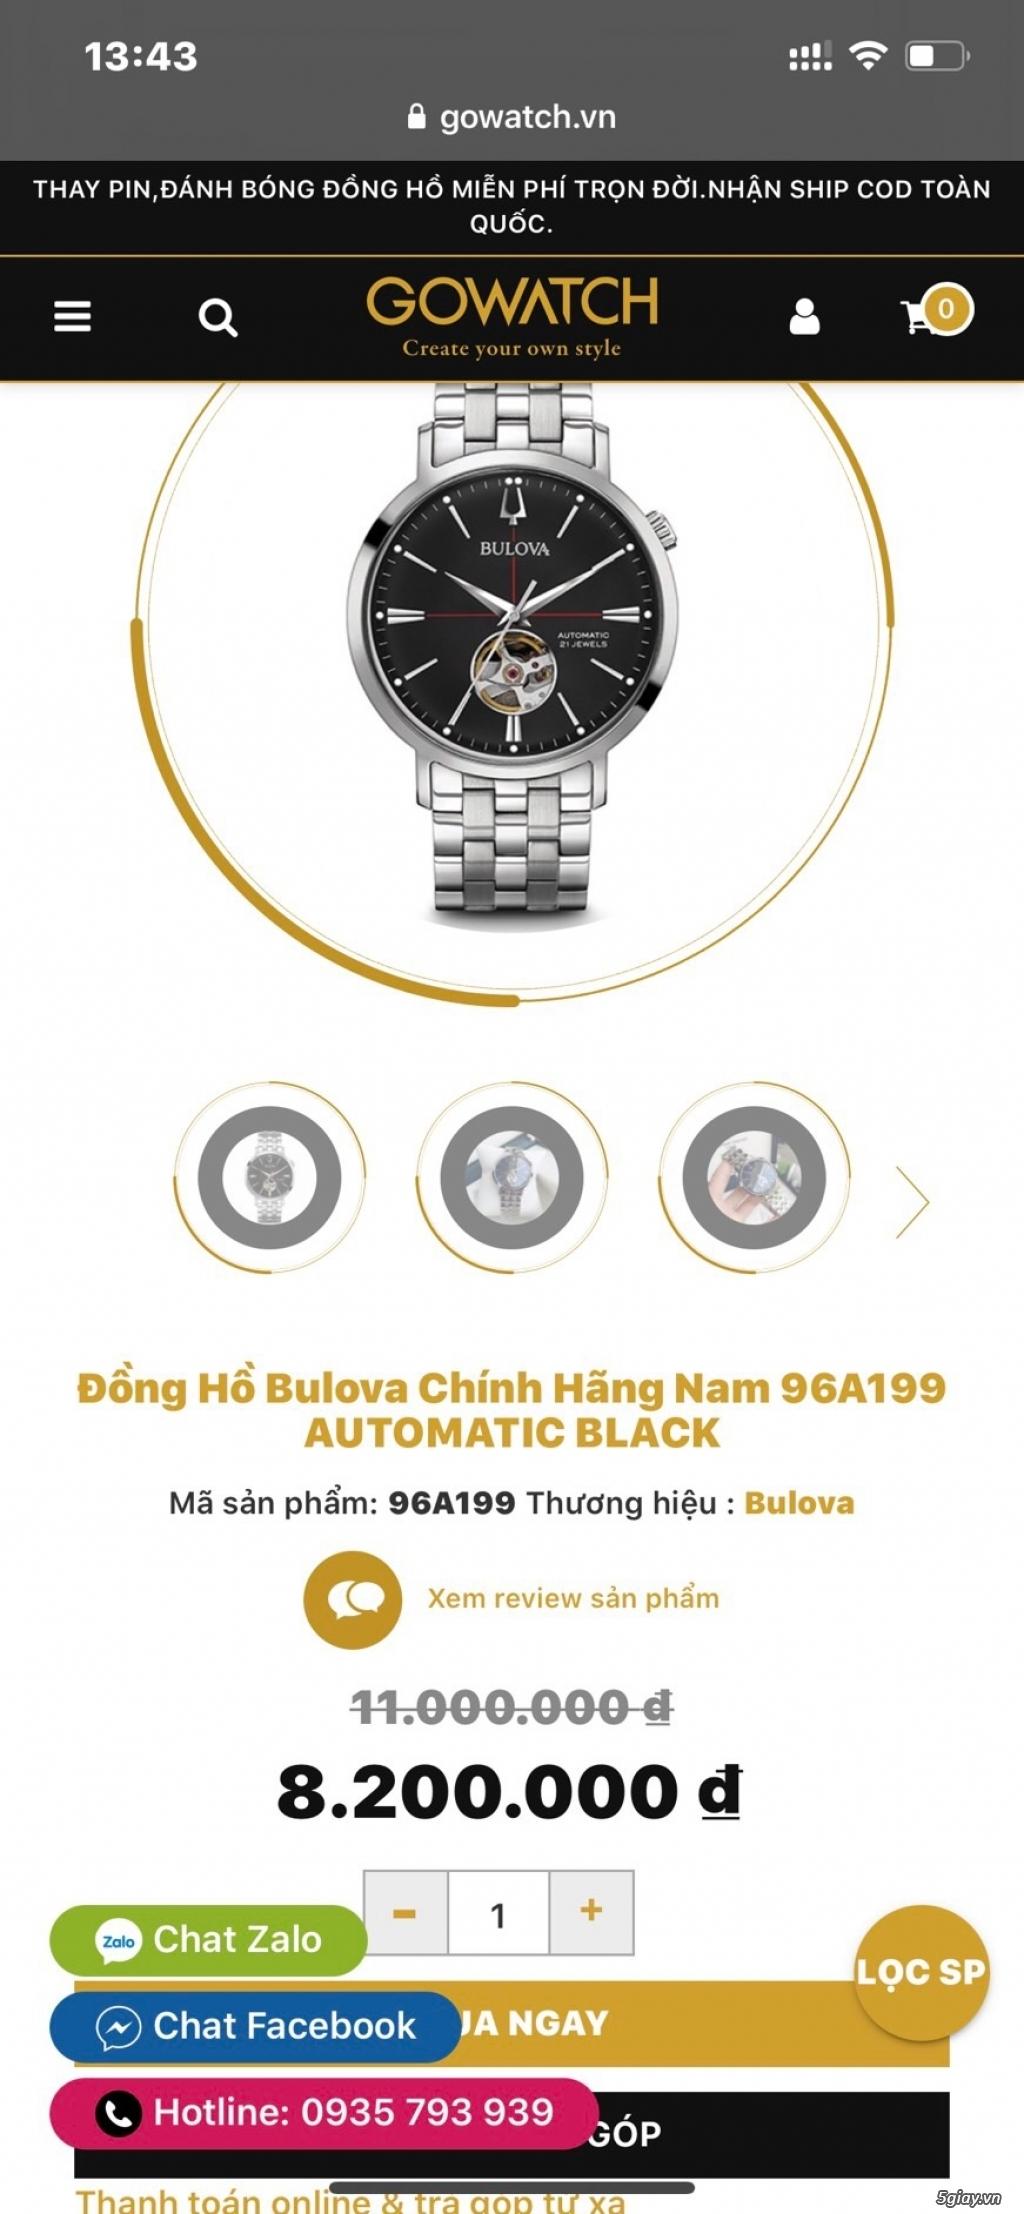 Đồng hồ Bulova 96A199 GIÁ BAO TỐT - 1